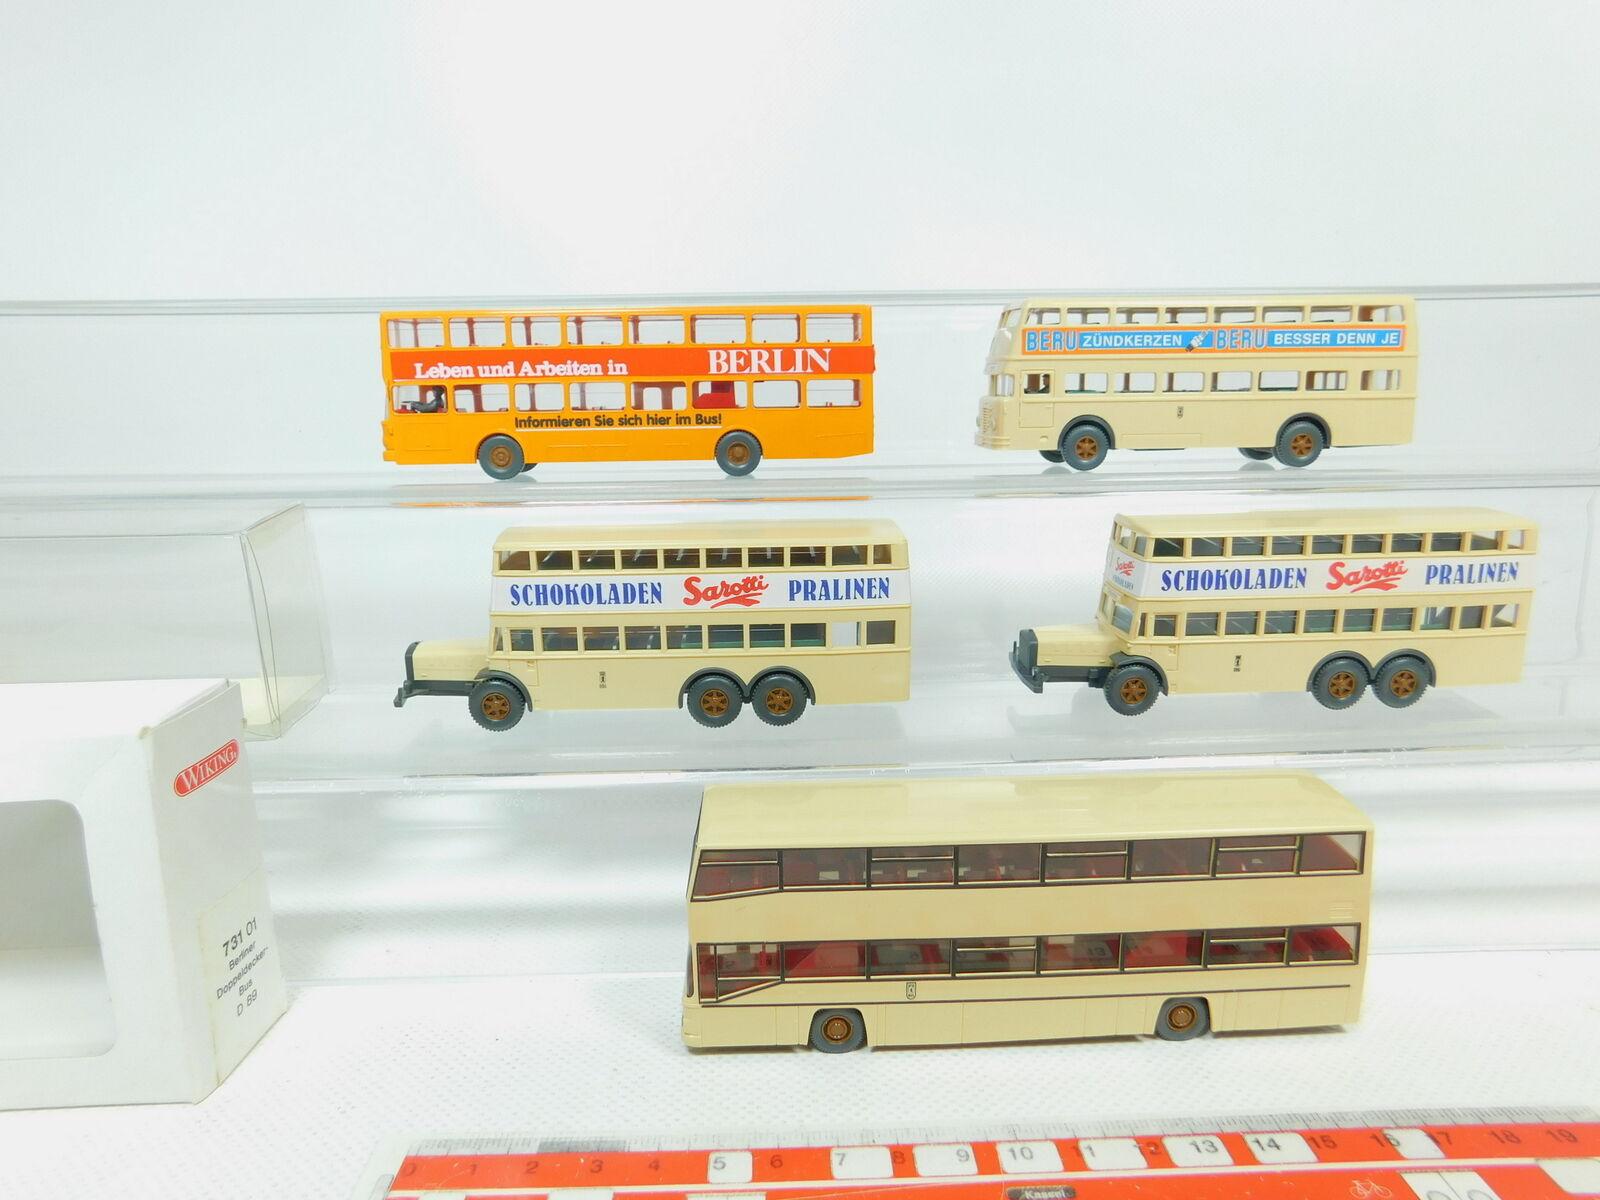 Bn114-0, 5  5x WIKING h0 1 87 Bus  873 Berlin-bus D 38+ on + Büssing +731, 2x Neuf dans sa boîte